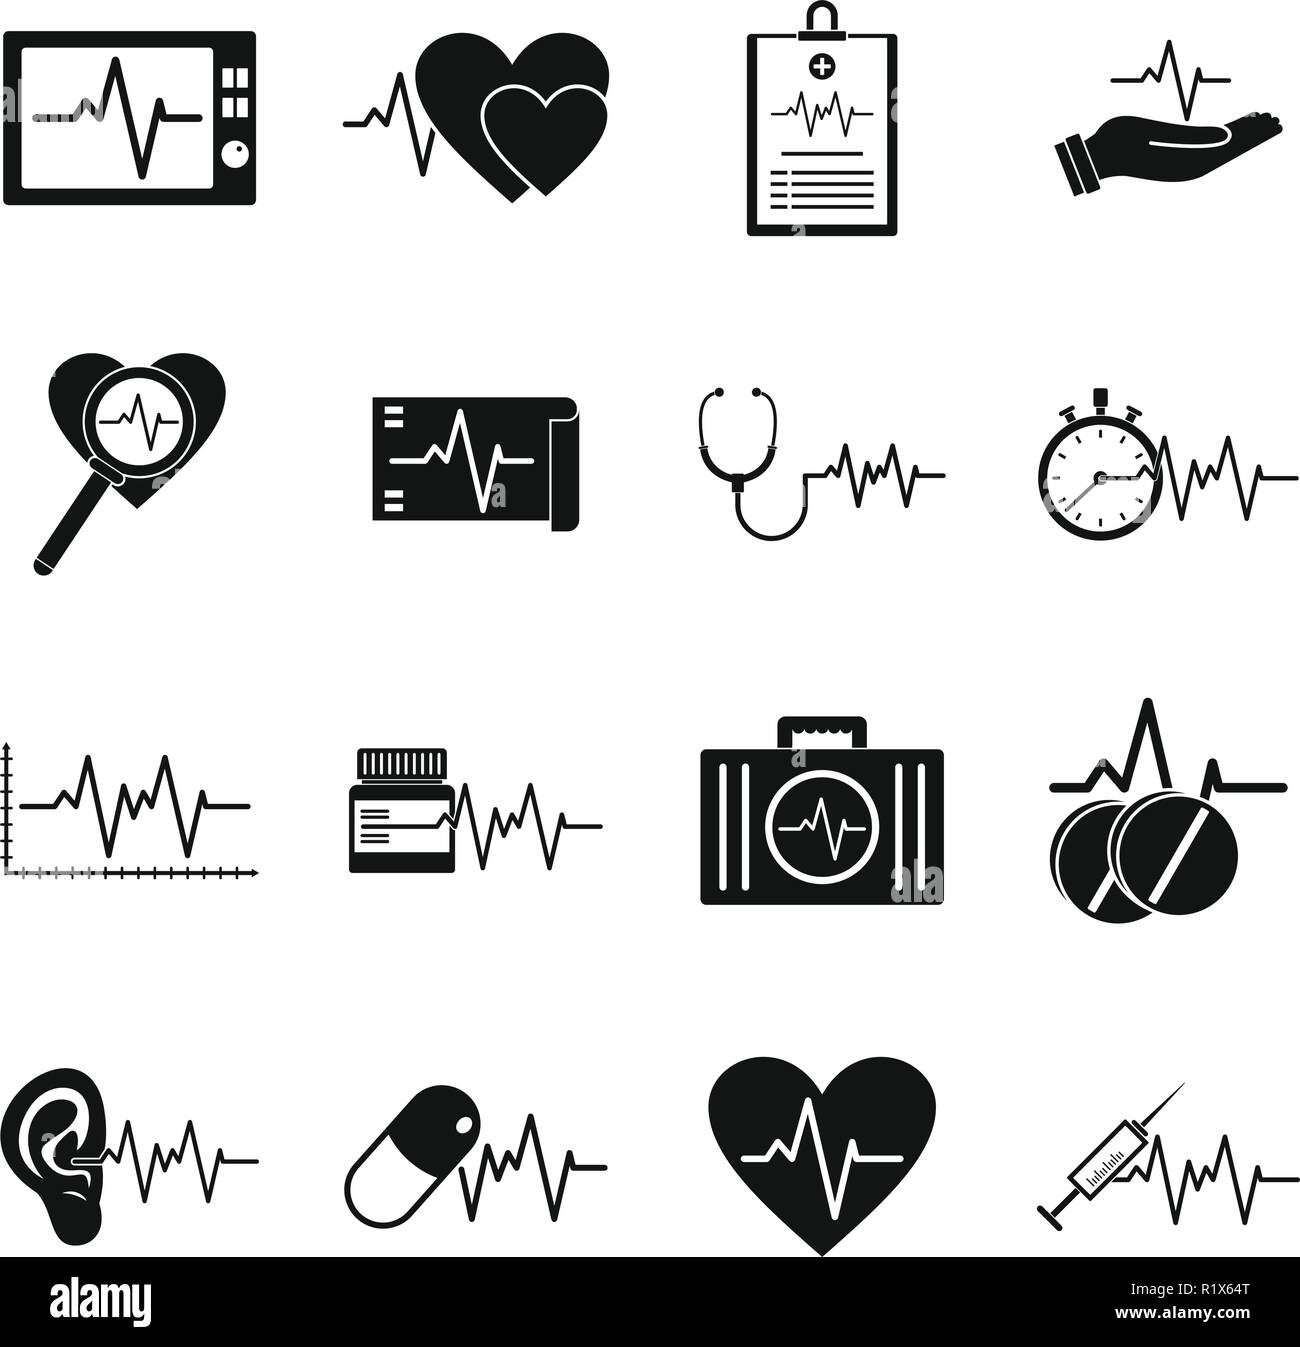 Heart pulse beat icons set. Simple illustration of 25 heart pulse beat vector icons for web - Stock Vector